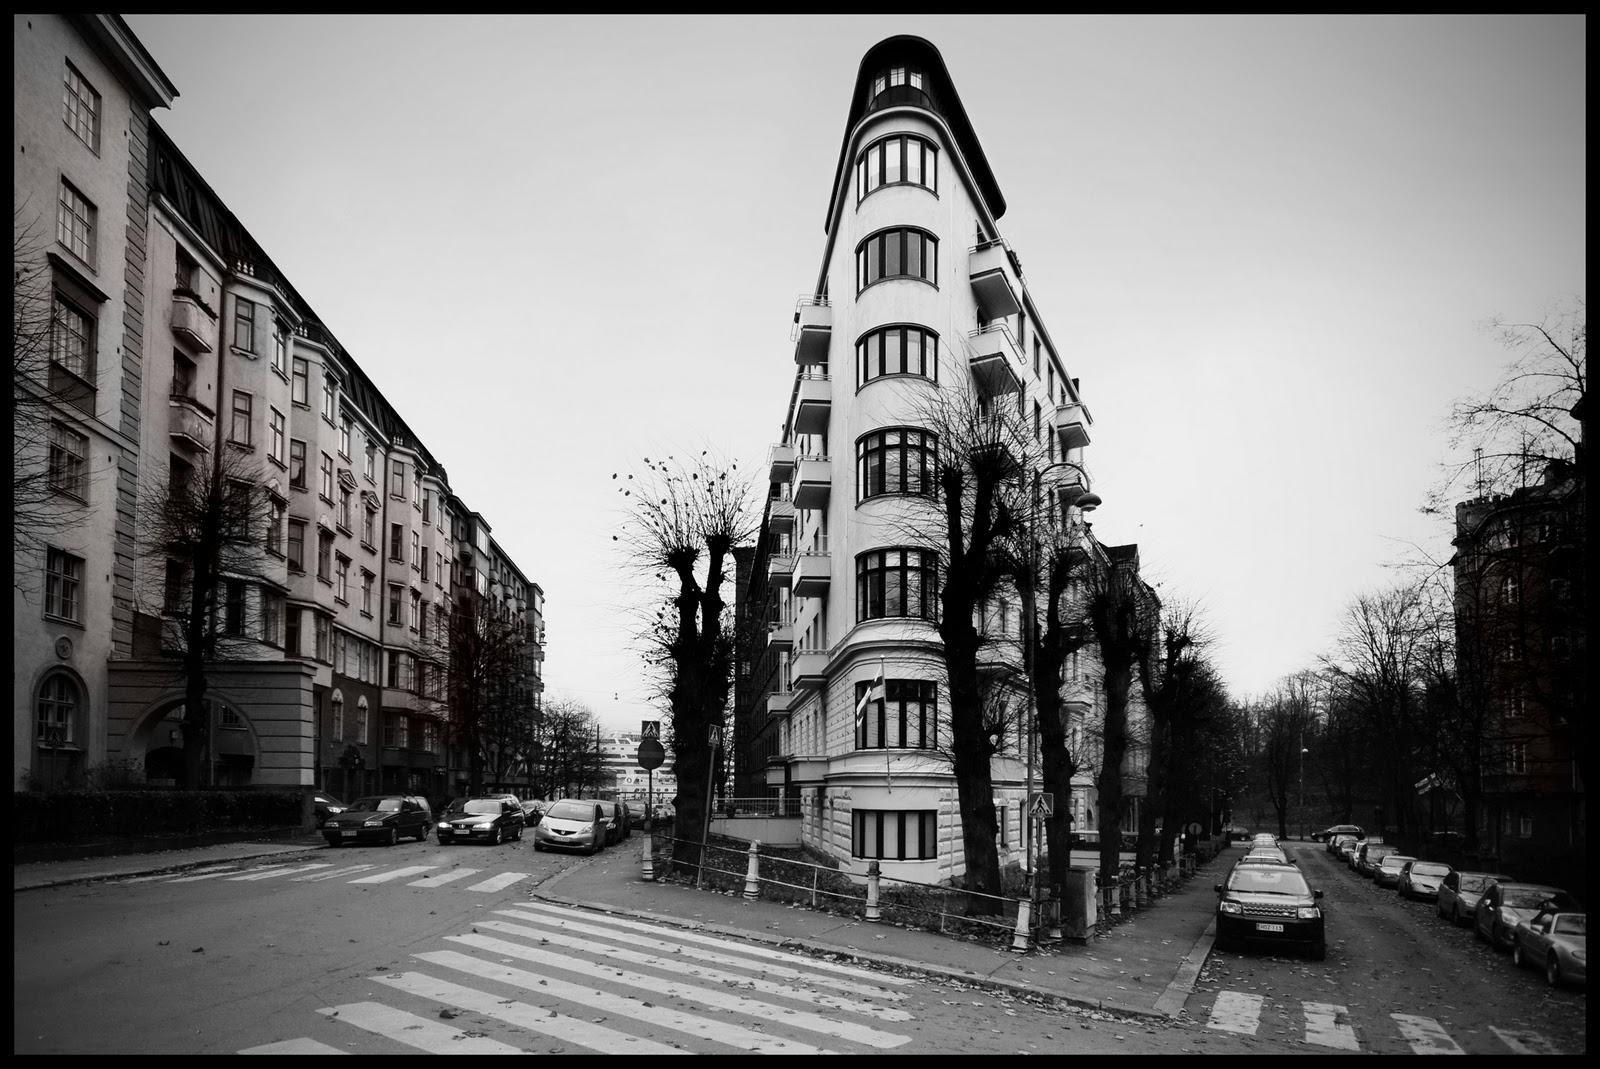 VALOKUVAUS: Helsinki